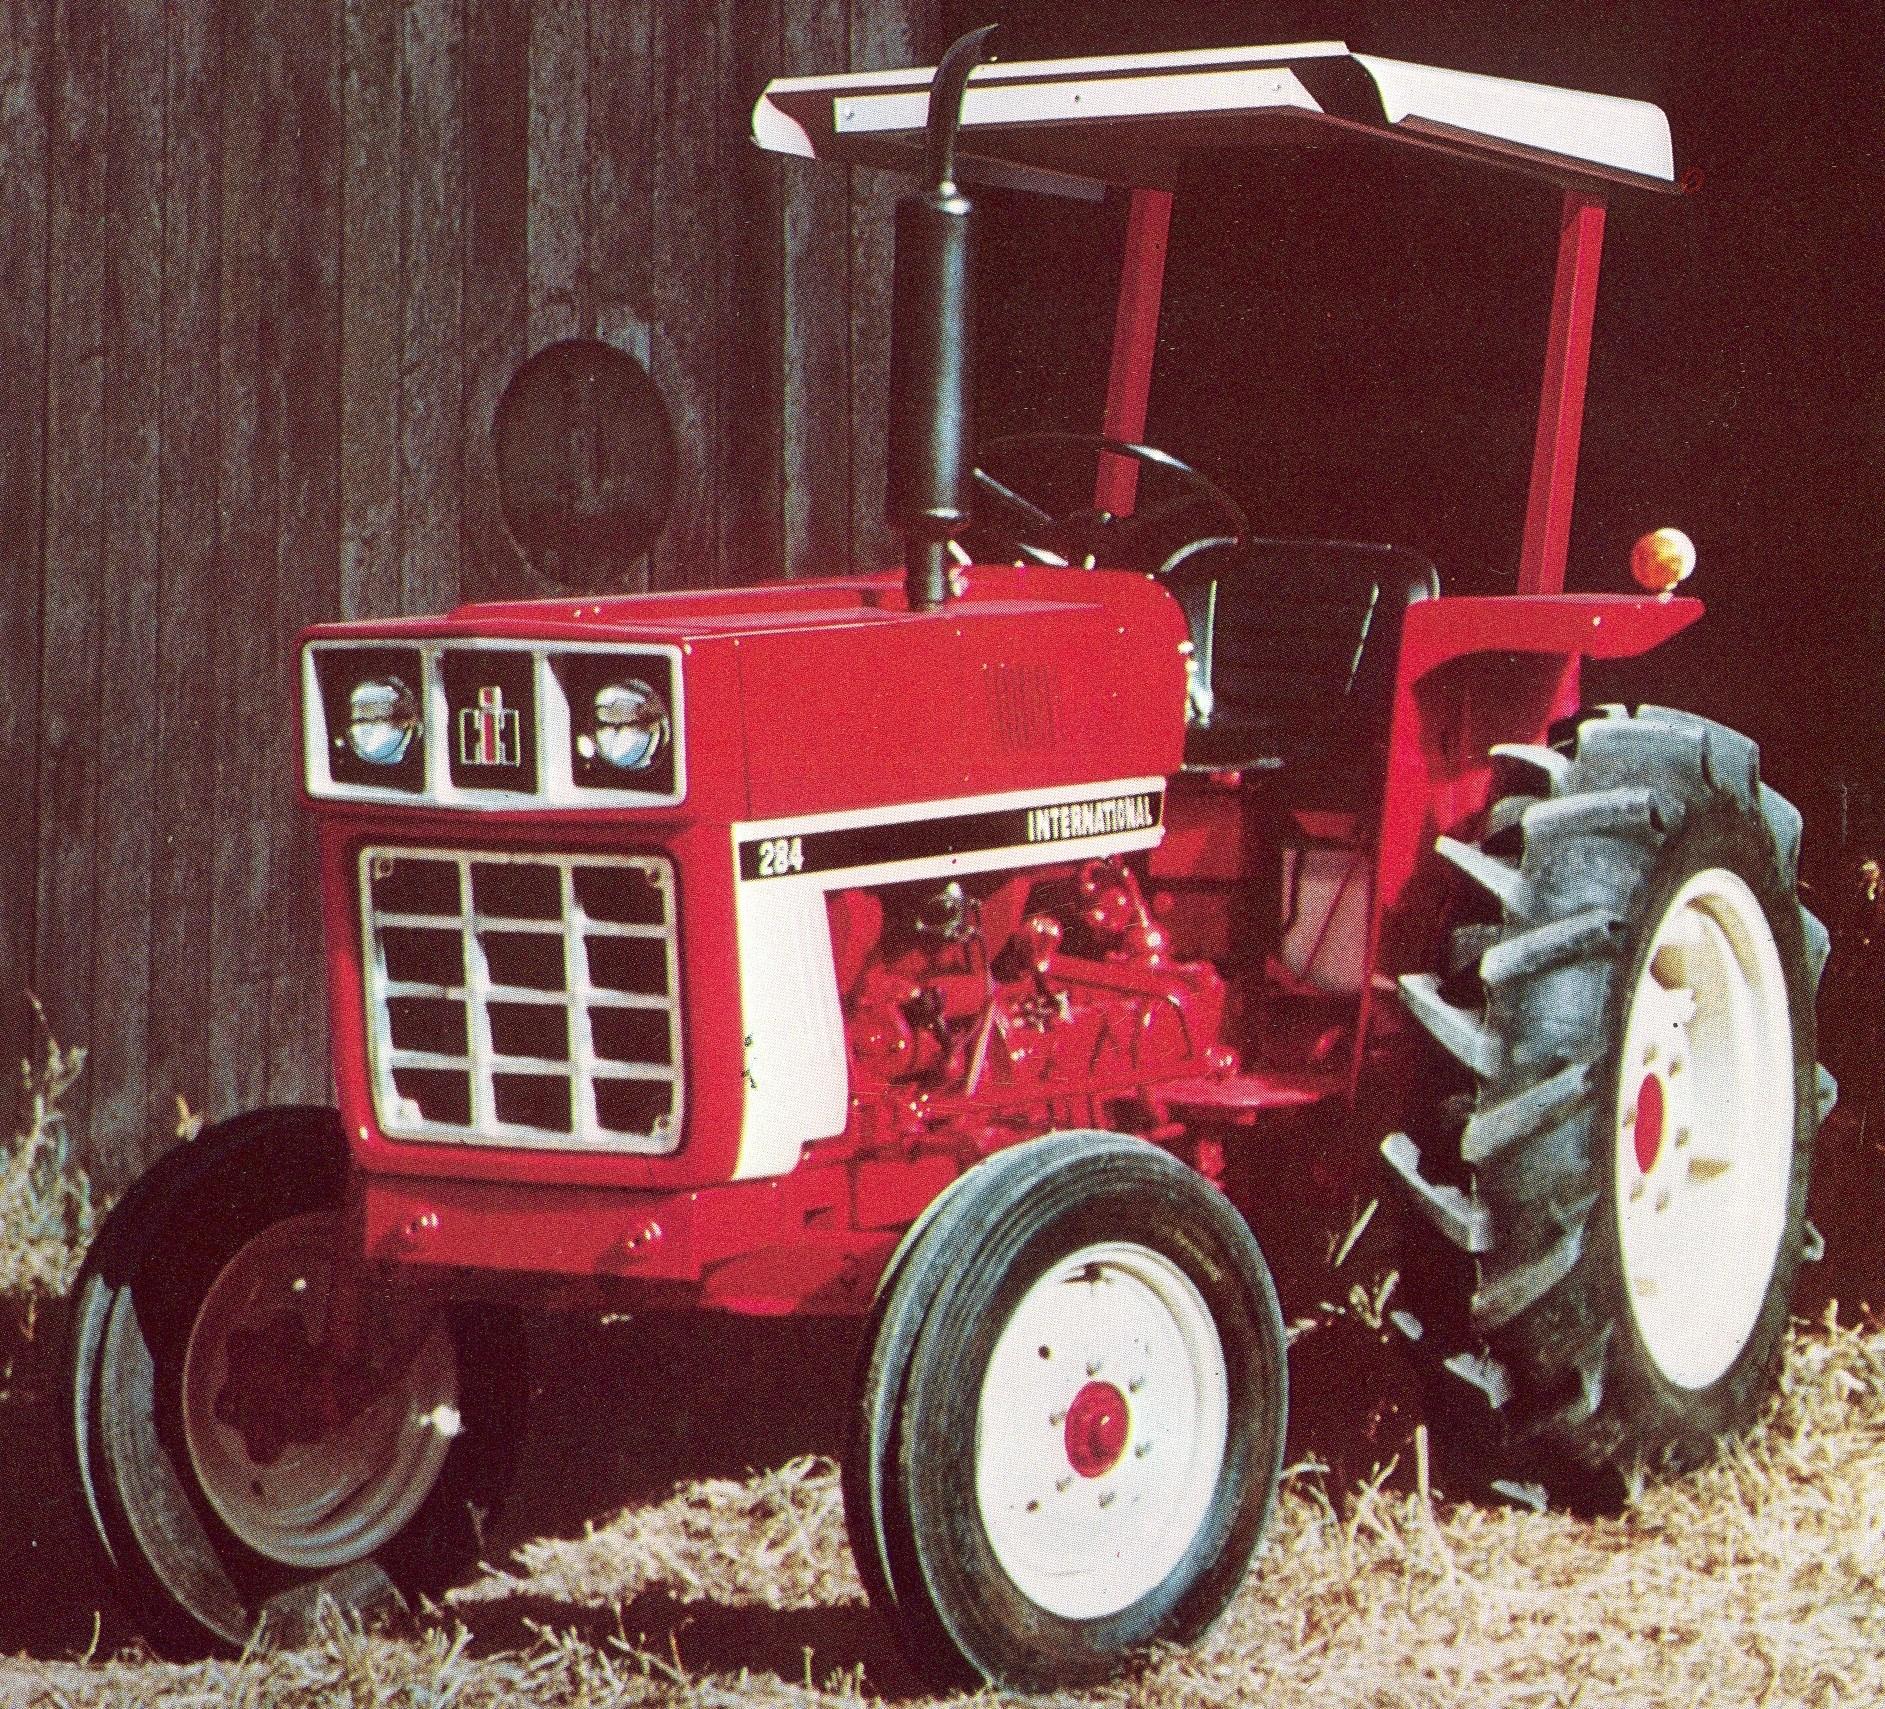 International 284 Gasoline | Tractor & Construction Plant Wiki | FANDOM powered by Wikia